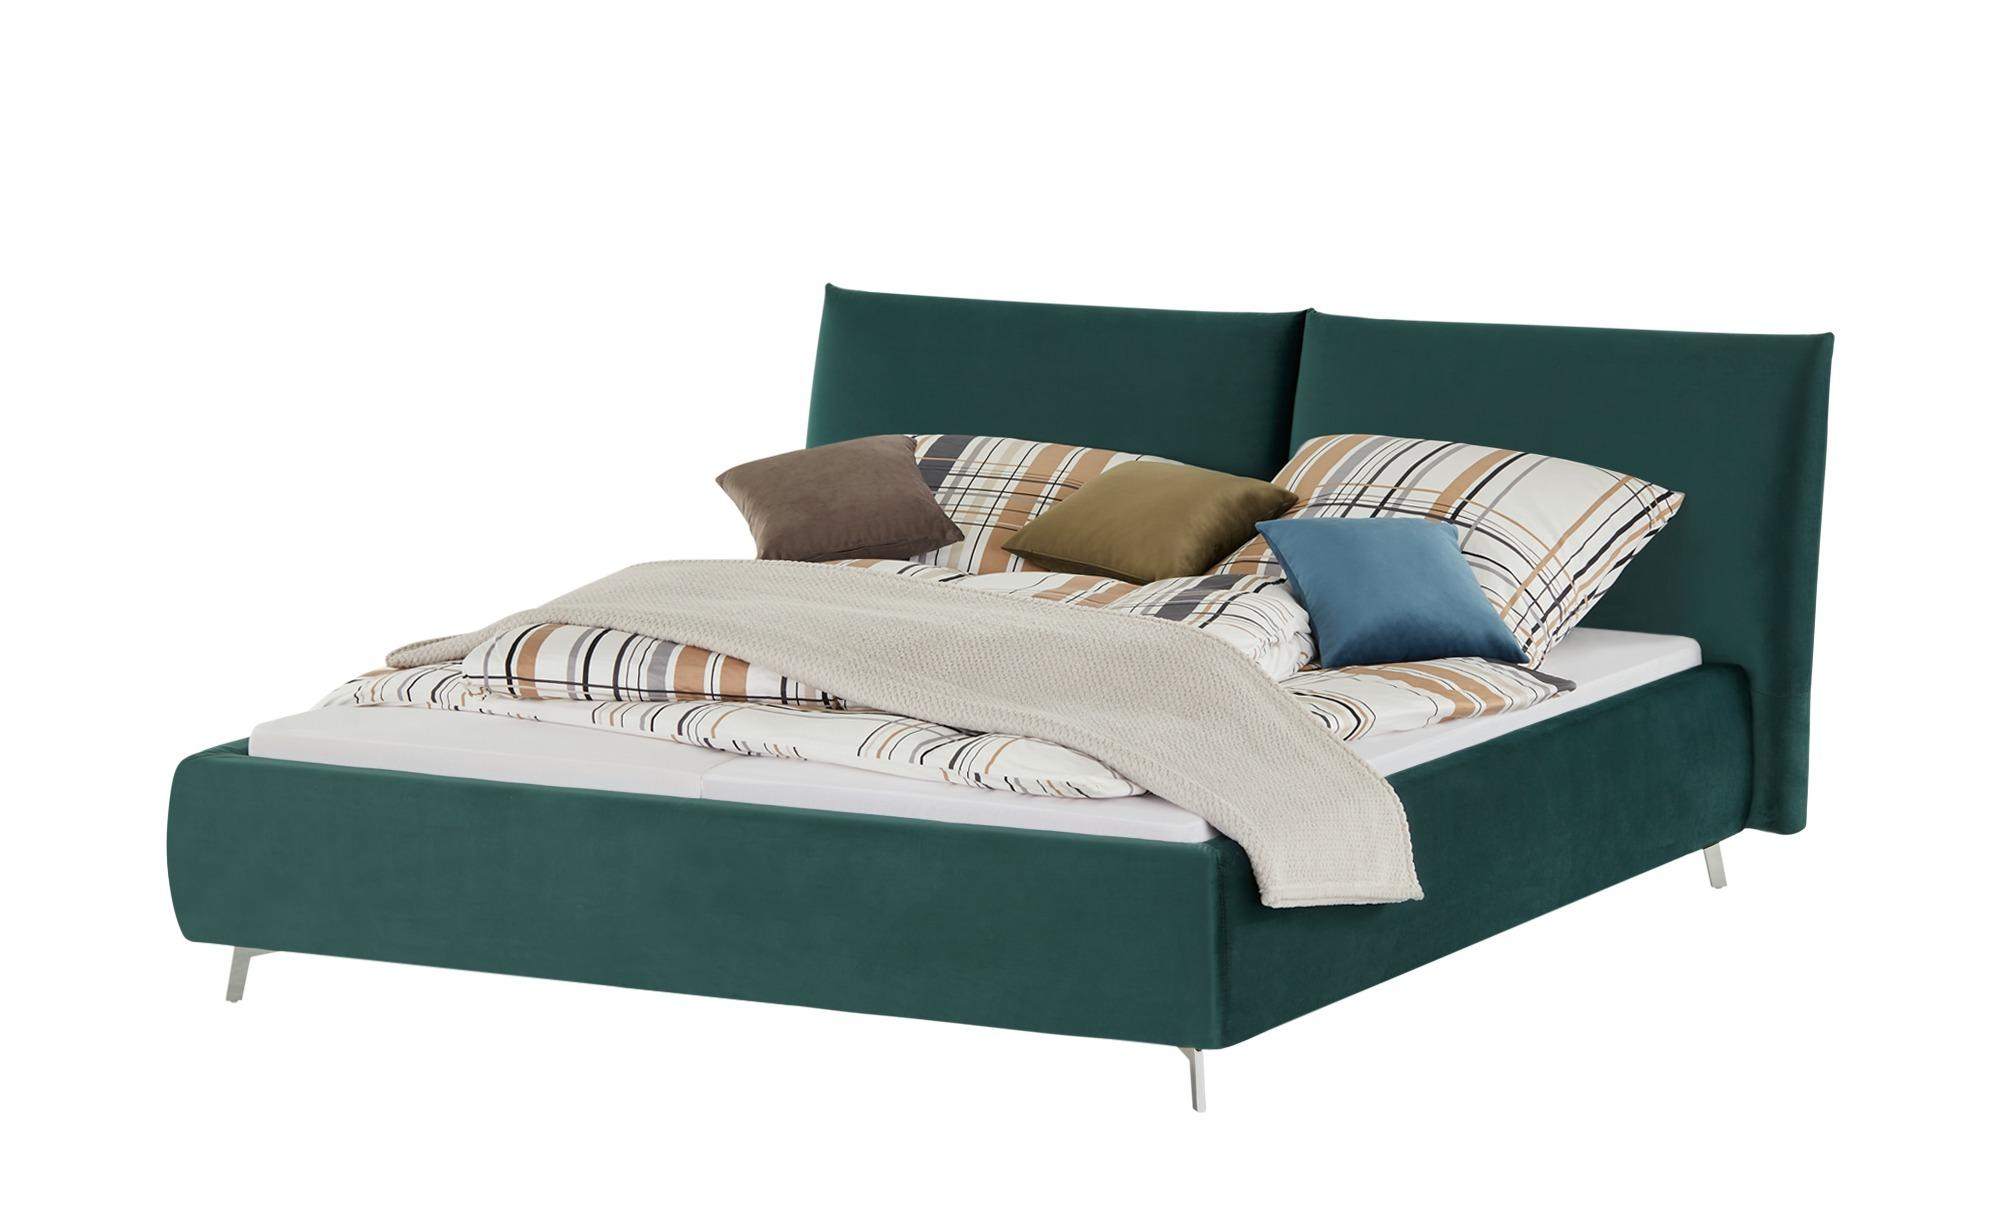 pop Polsterbettgestell  Homelike ¦ grün ¦ Maße (cm): B: 212 H: 105 Betten > Polsterbetten - Höffner